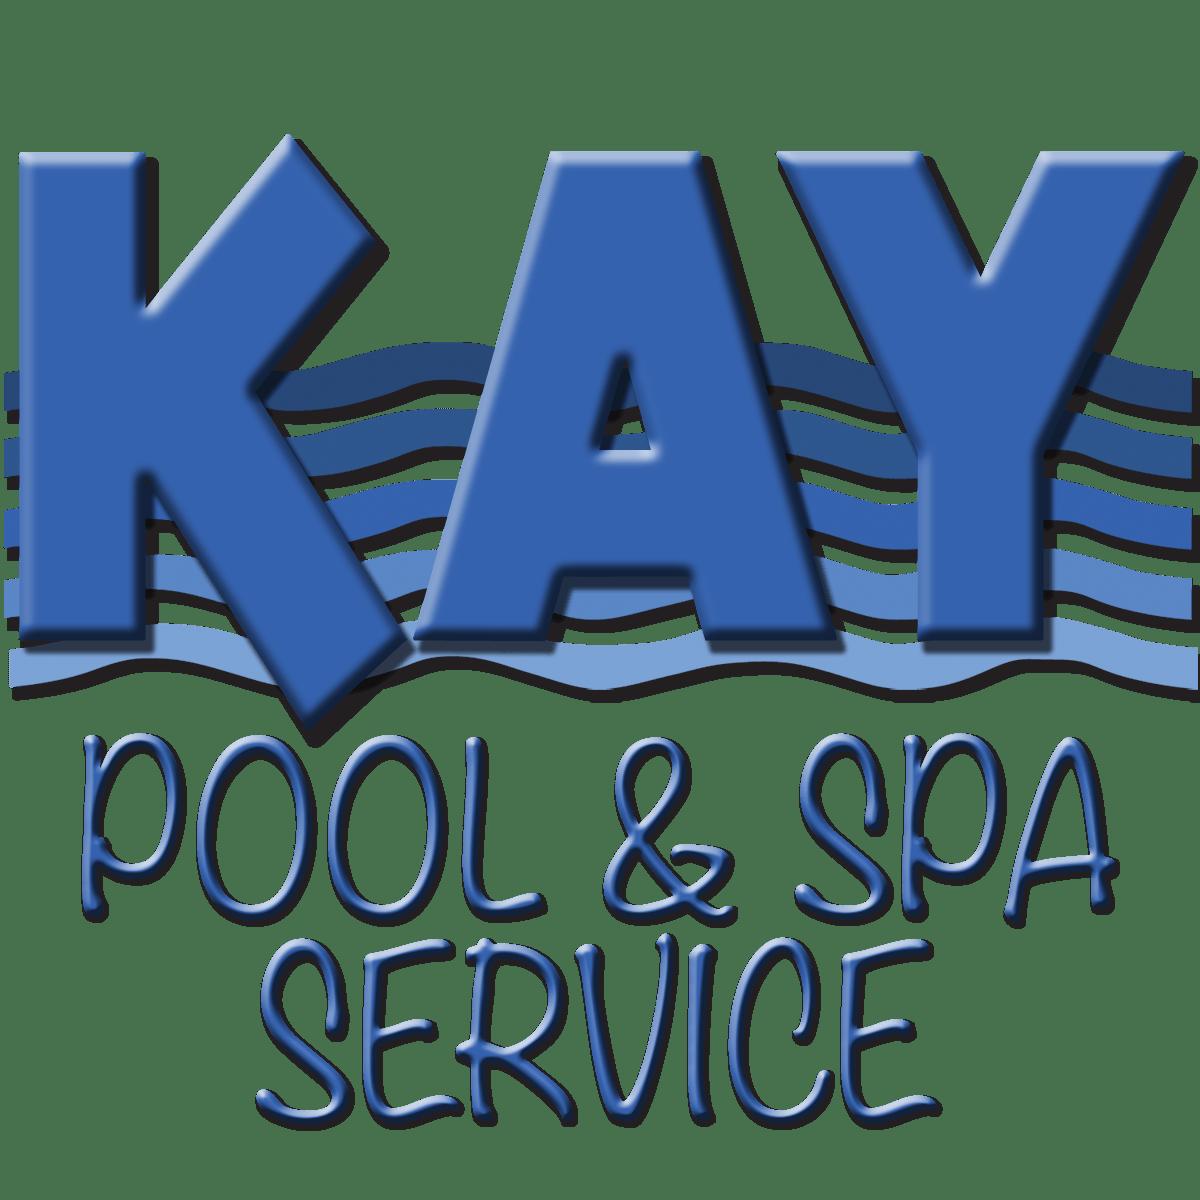 Contact Us - Kay Pool and Spa